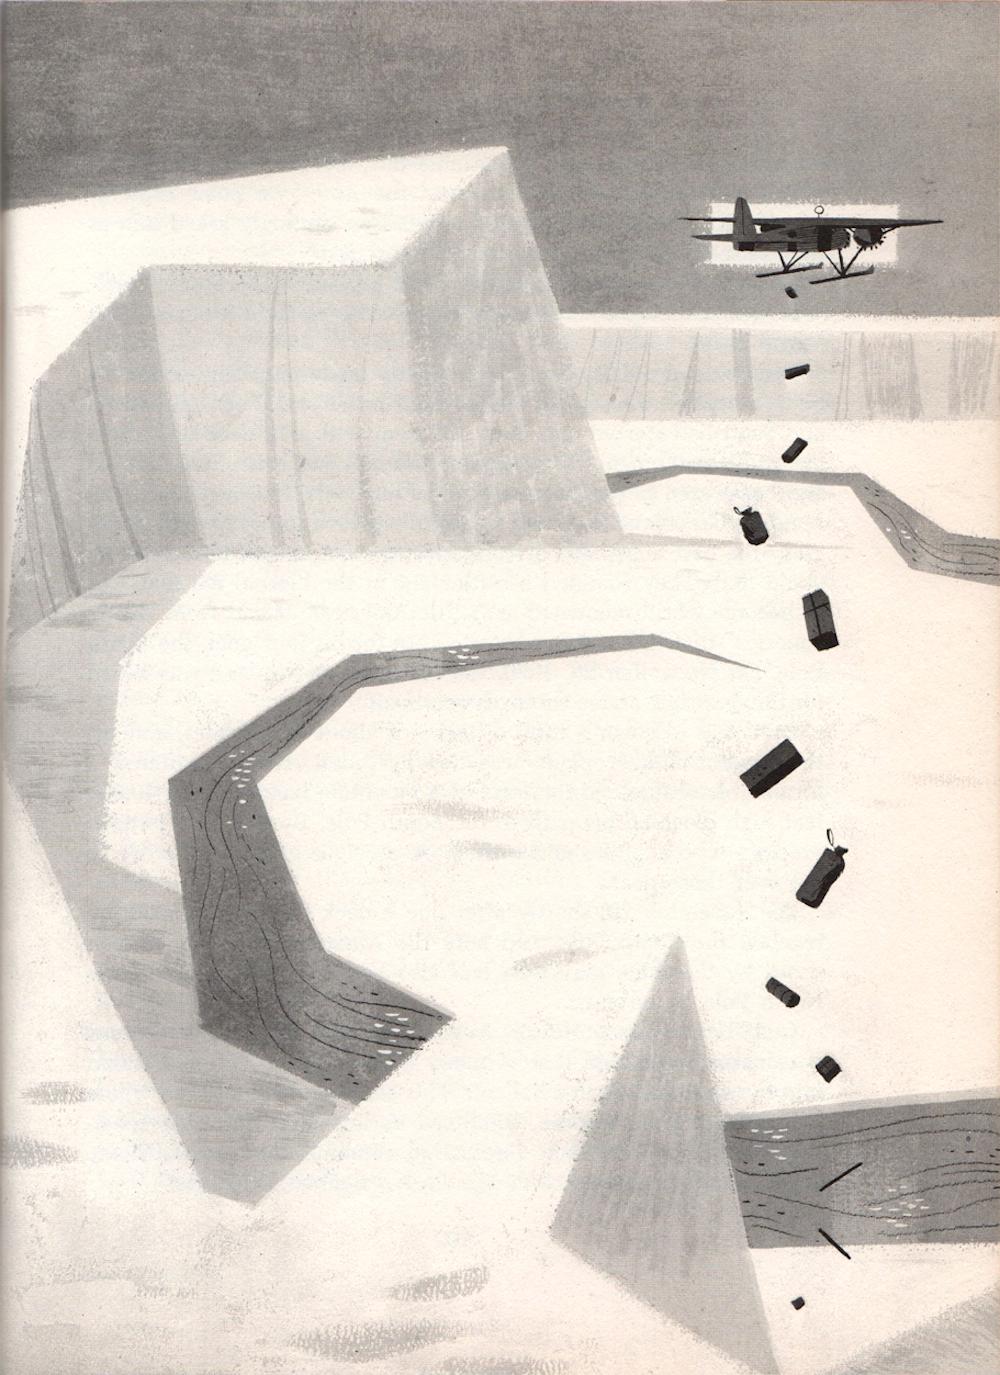 иллюстрации к Жюль Верну  Пласенсиа.jpg